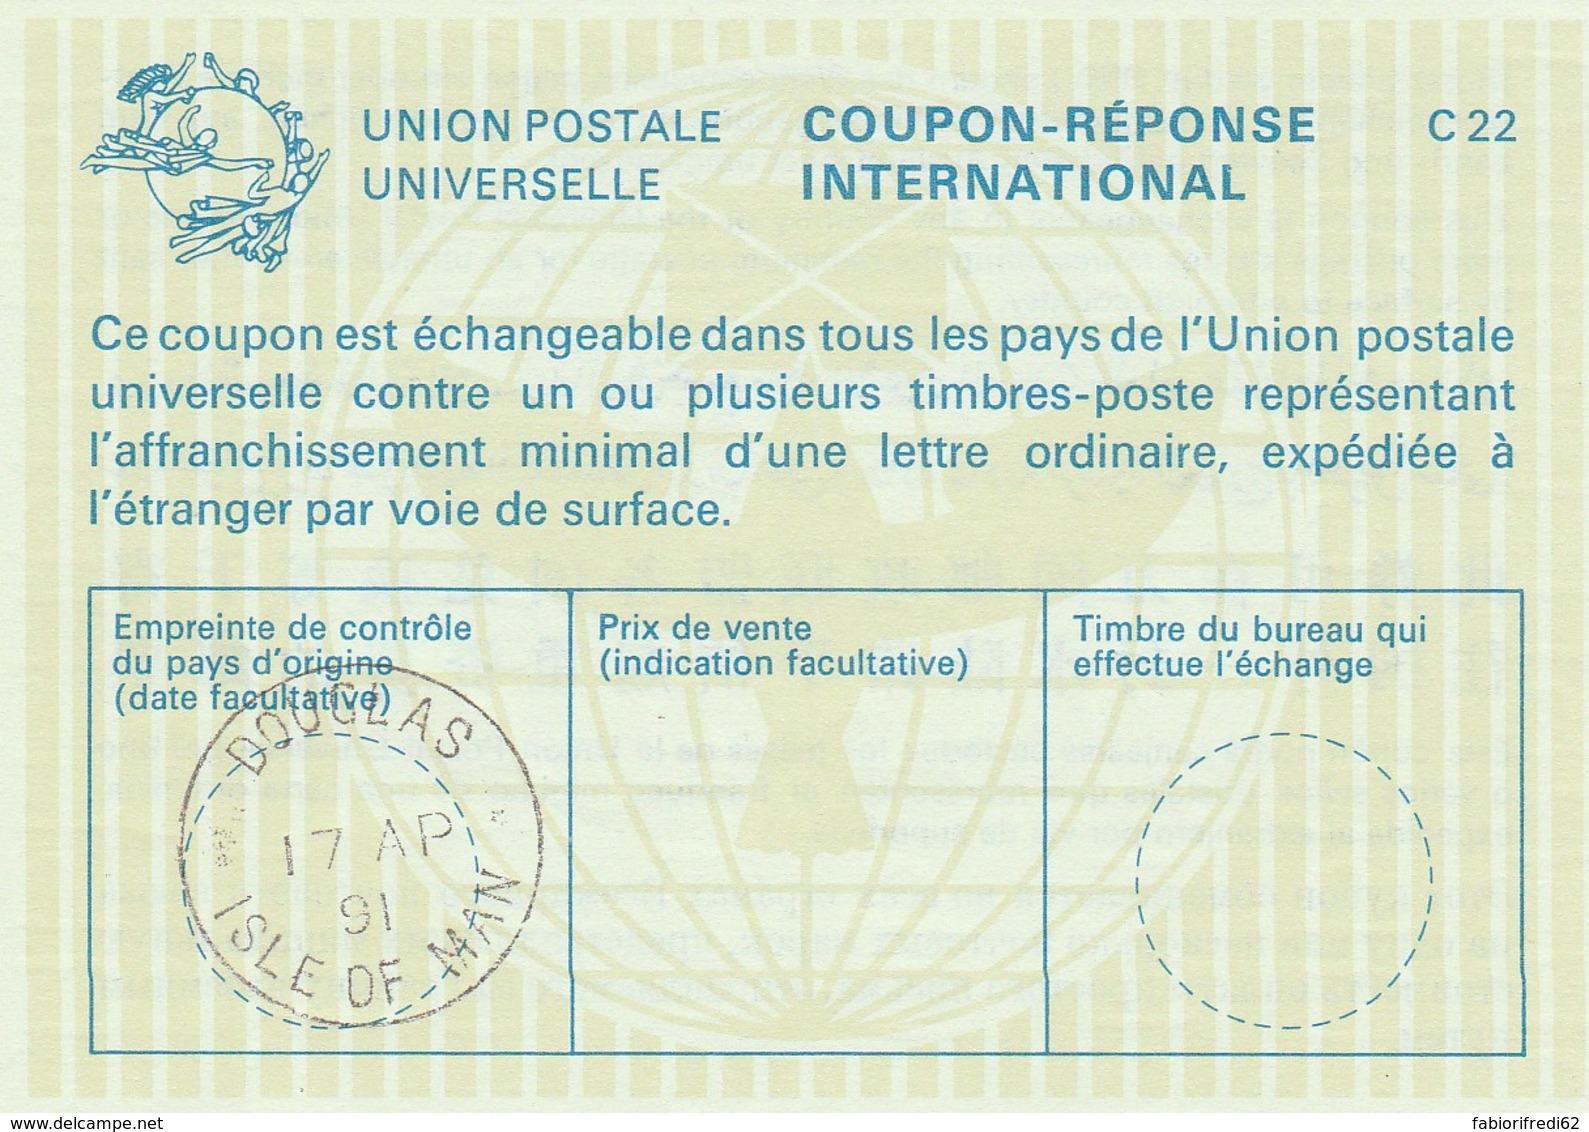 COUPON-REPONSE INTERNATIONAL 1991 DOUGLAS ISLE OF MAN (LY486 - Isola Di Man